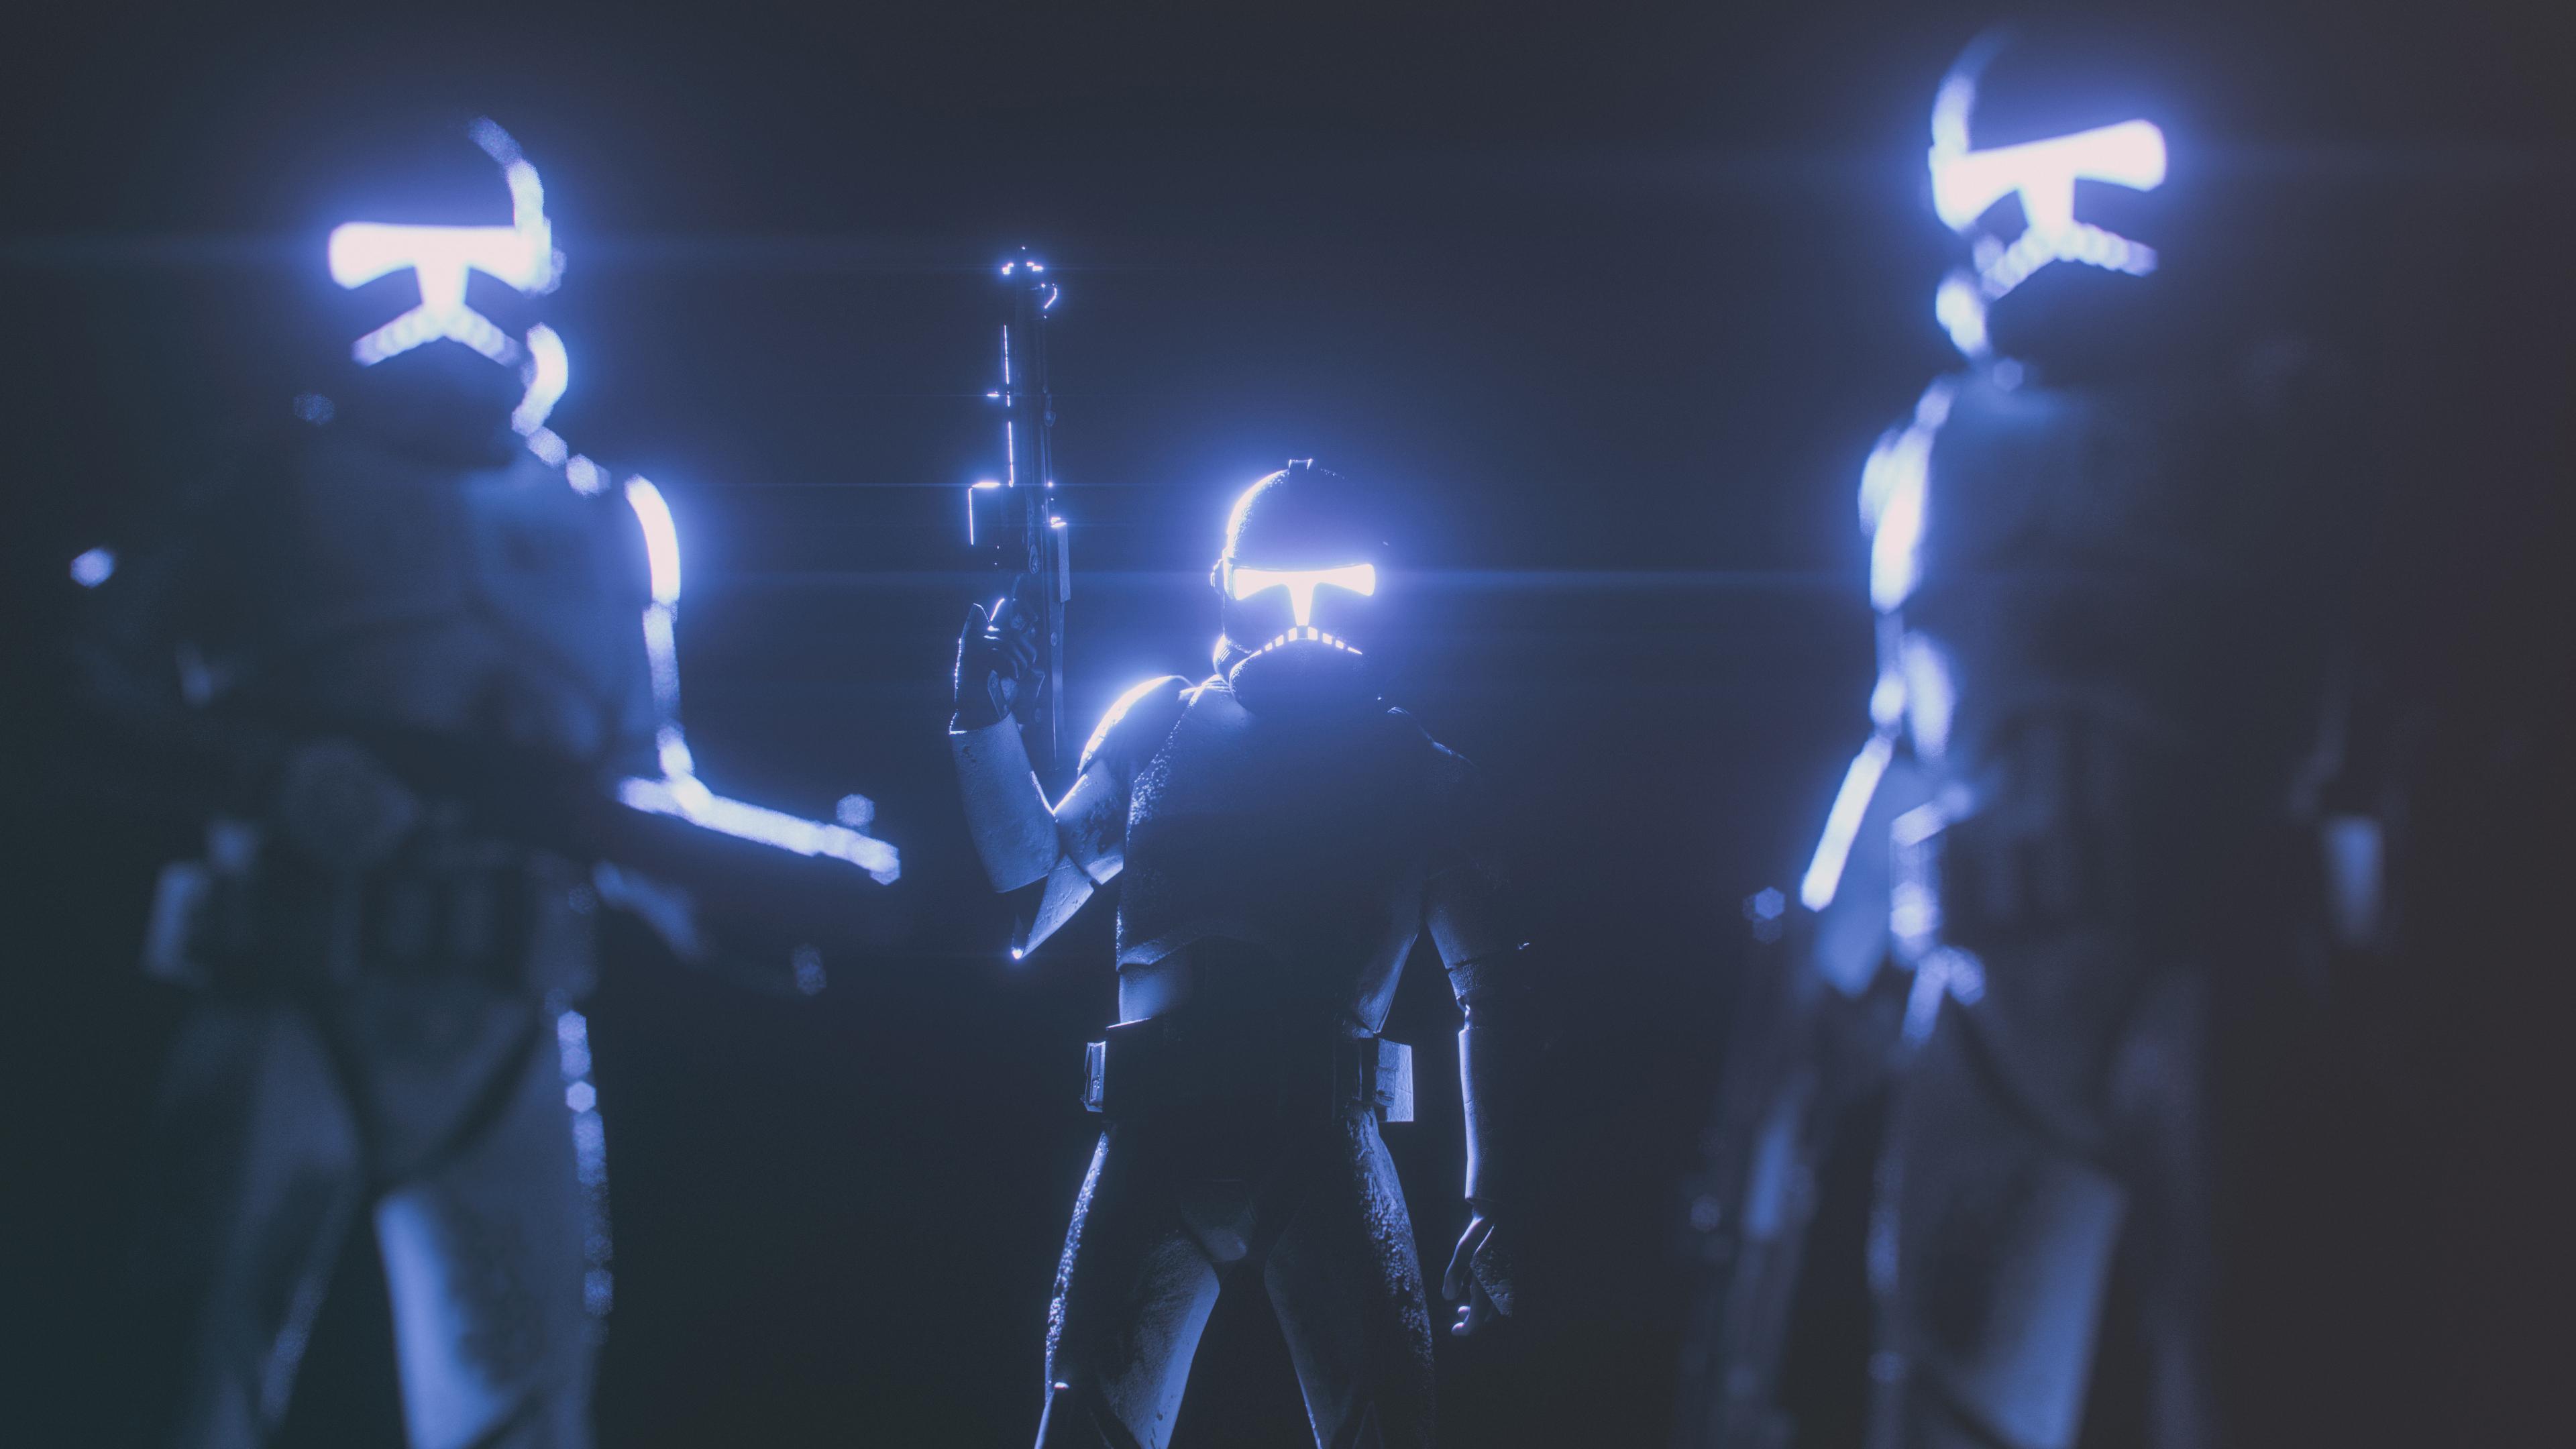 Clone Trooper Star Wars Hd Movies 4k Wallpapers Images